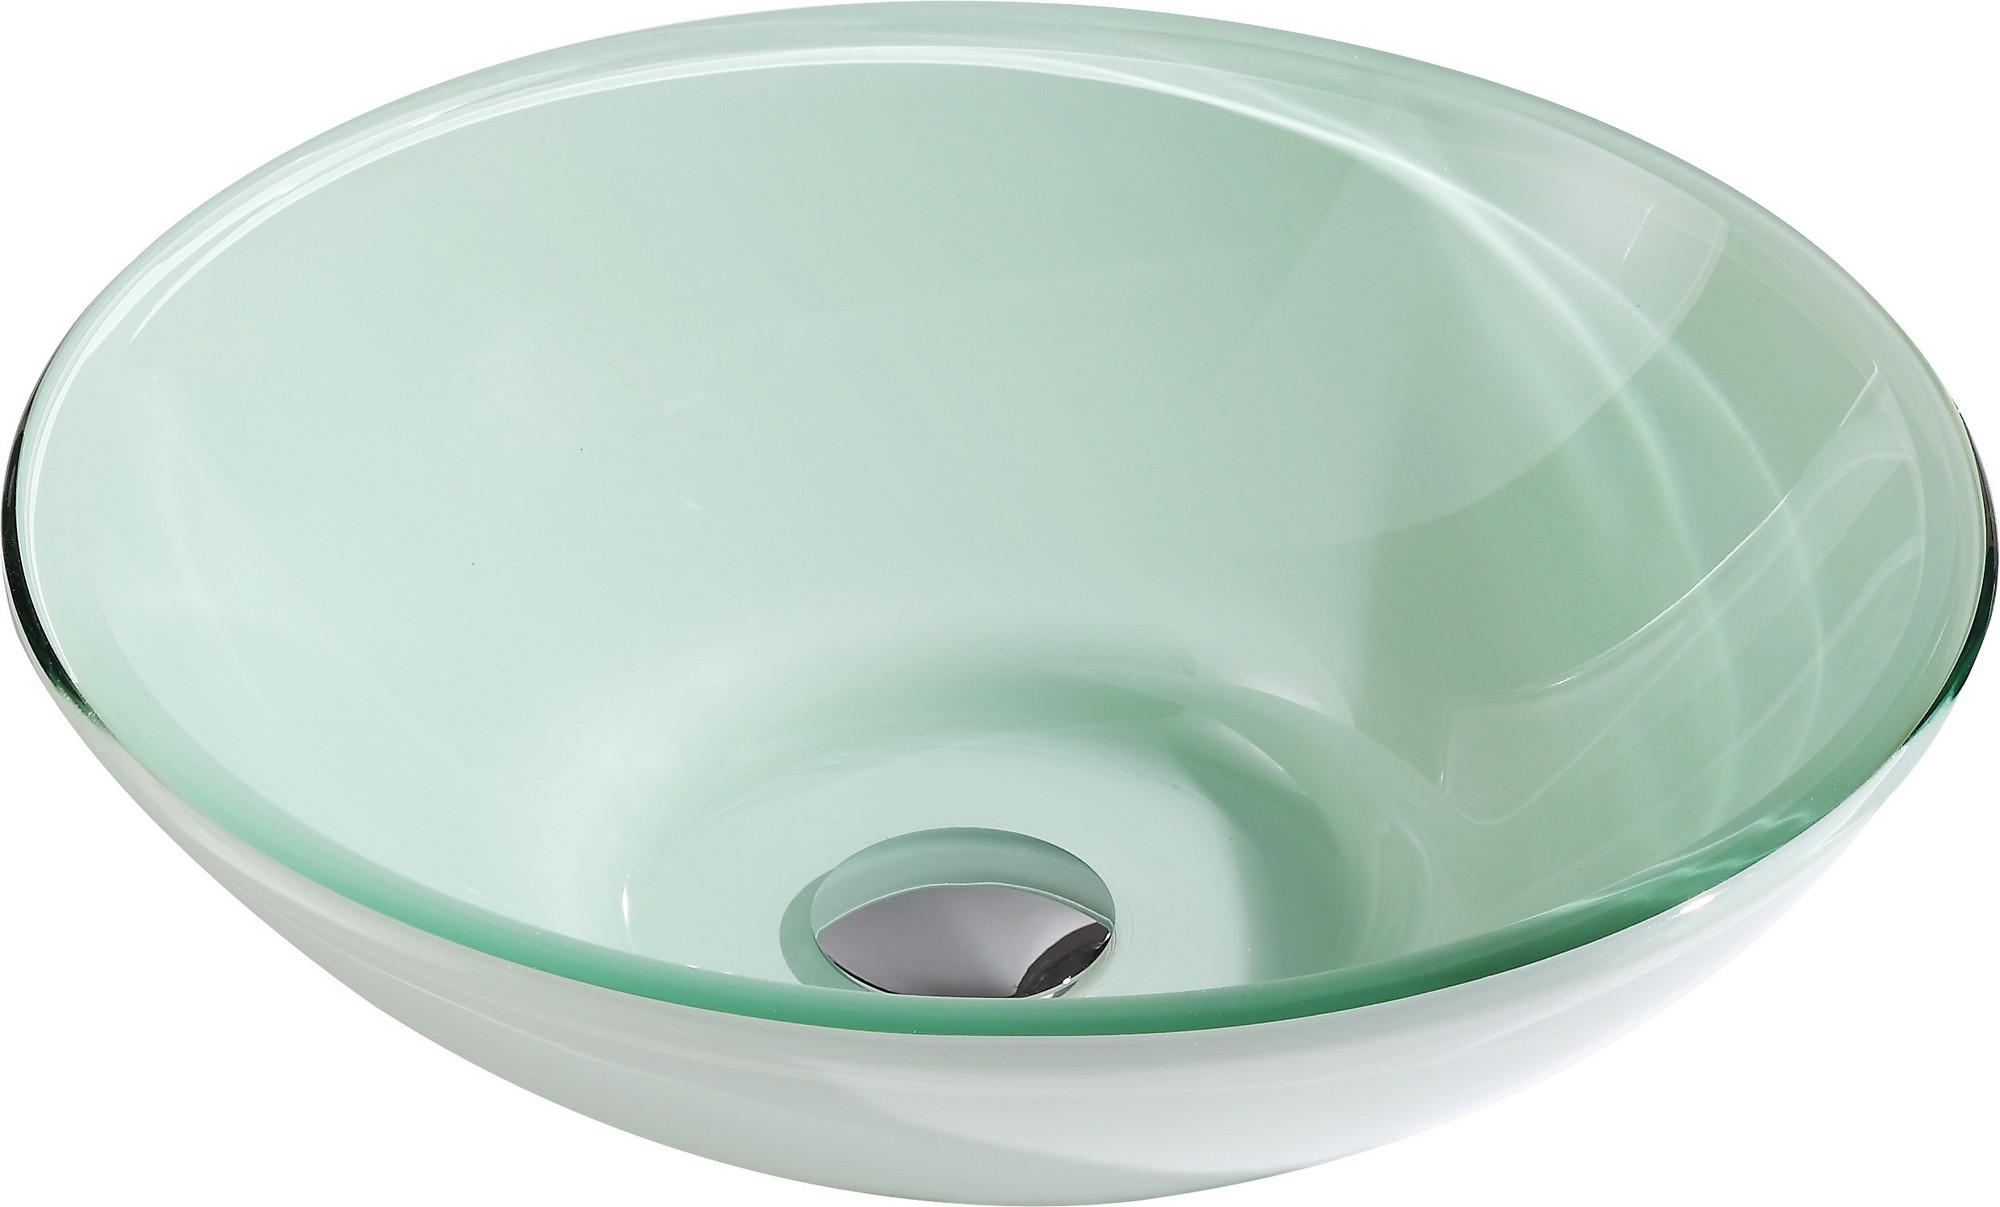 ANZZI LS-AZ083 Sonata Series Deco-Glass Vessel Sink In Lustrous Light Gree